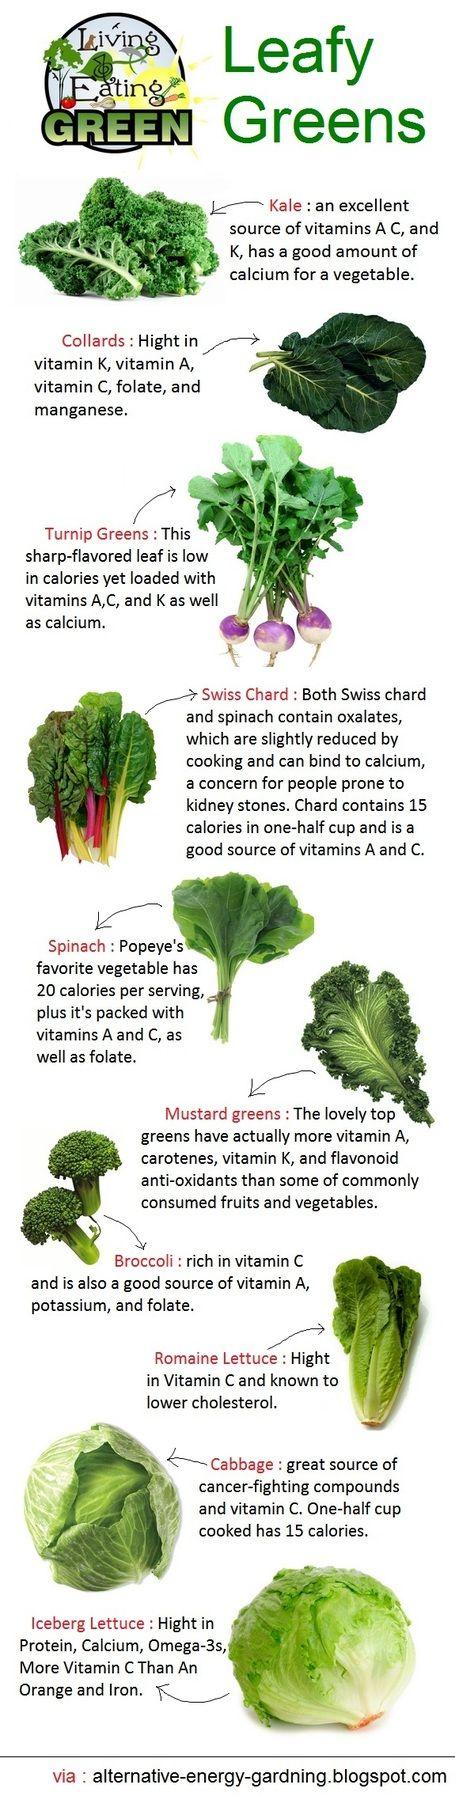 Alternative Gardning List Of Leafy Green Vegetables Healthy Eating Vegetables Healthy Recipes